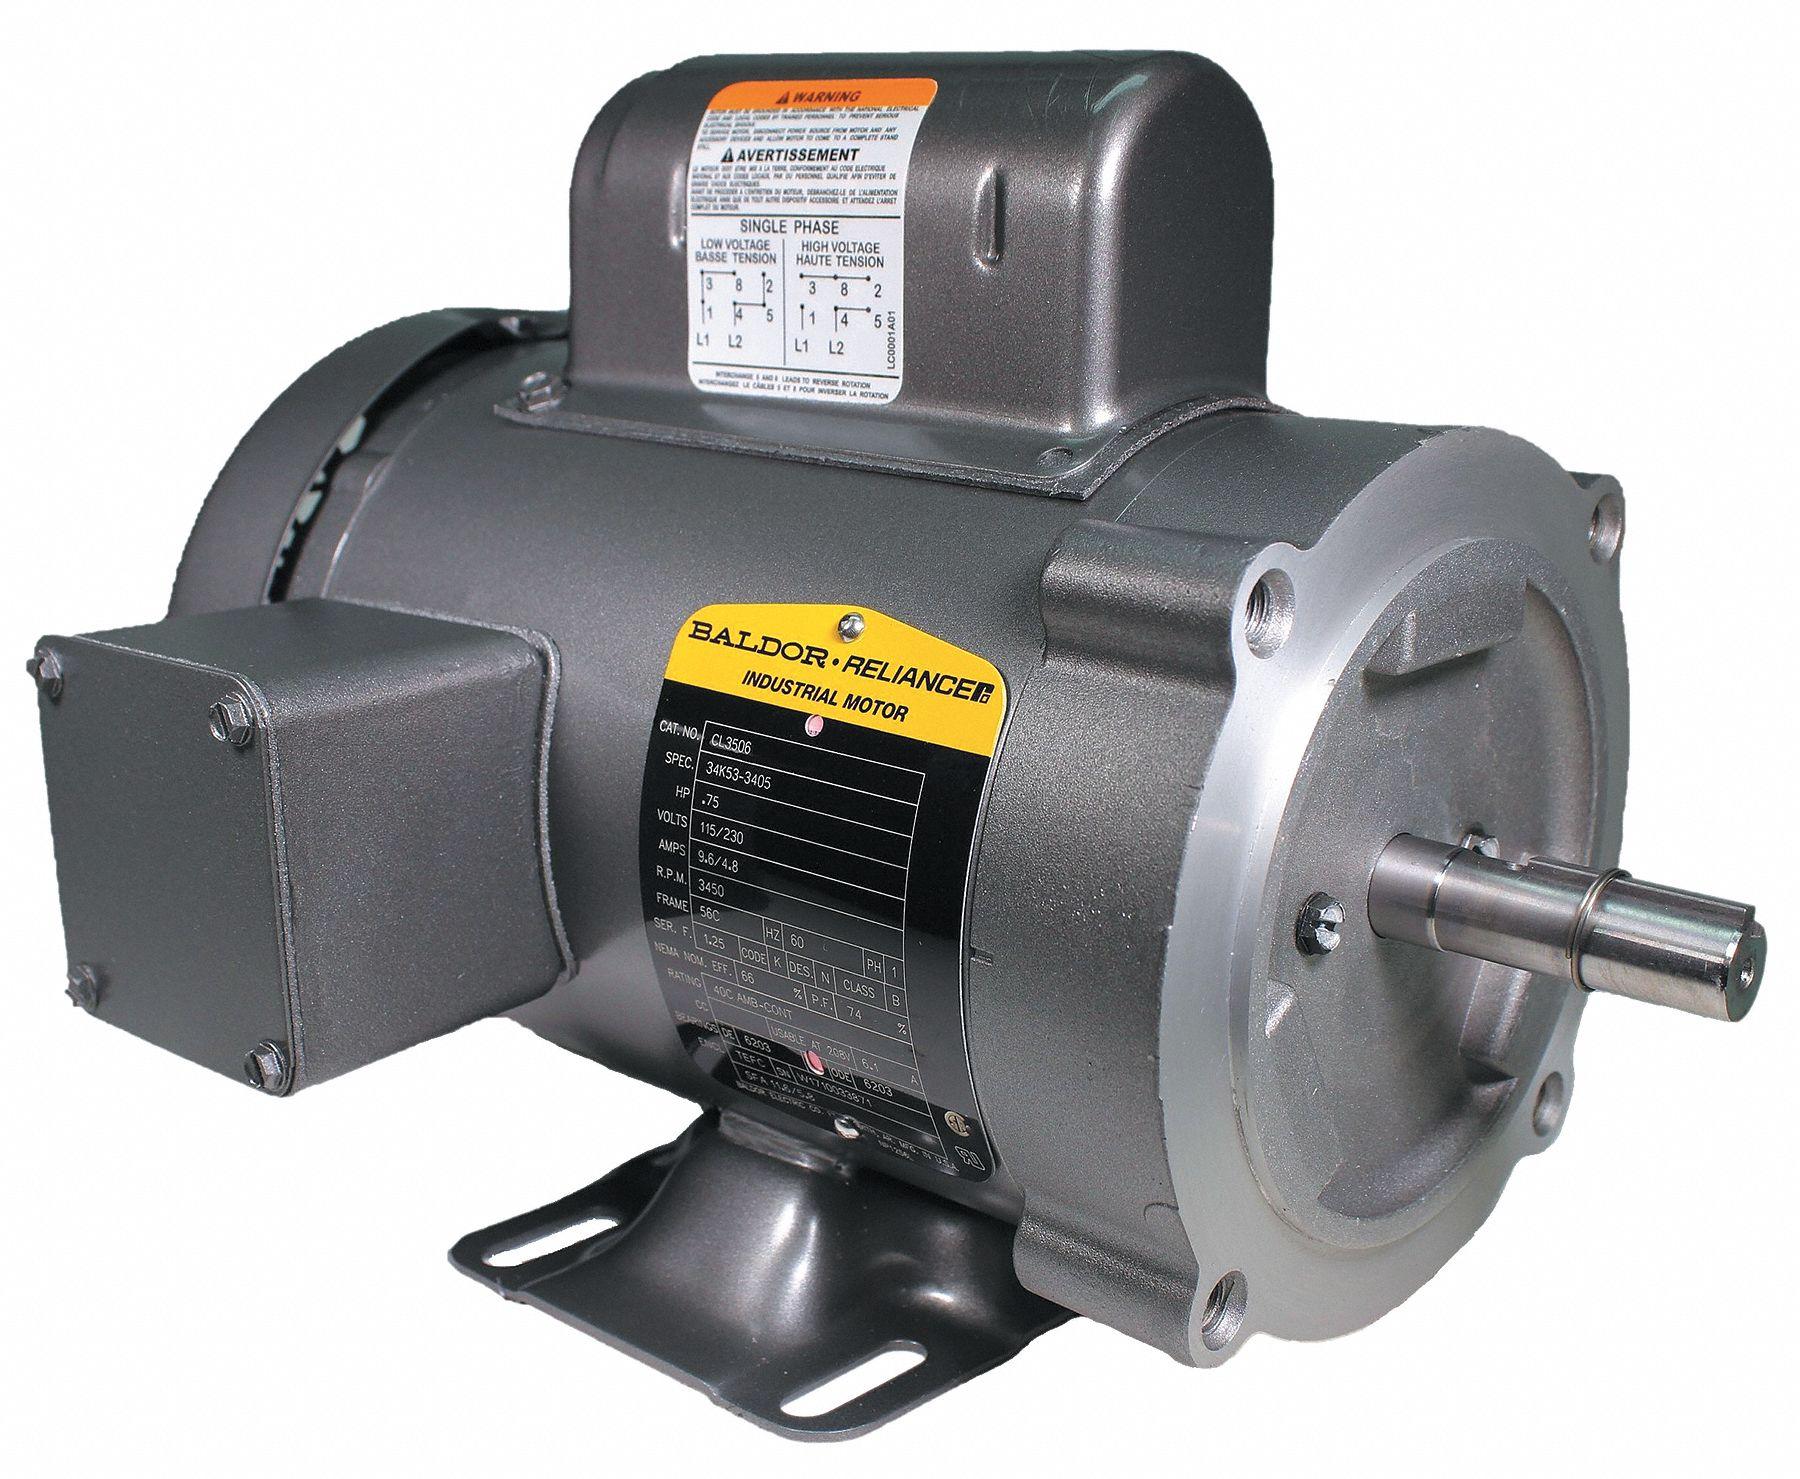 Baldor Electric Motor 3 4 Hp 3450 Rpm 115 230v 56c Tefc